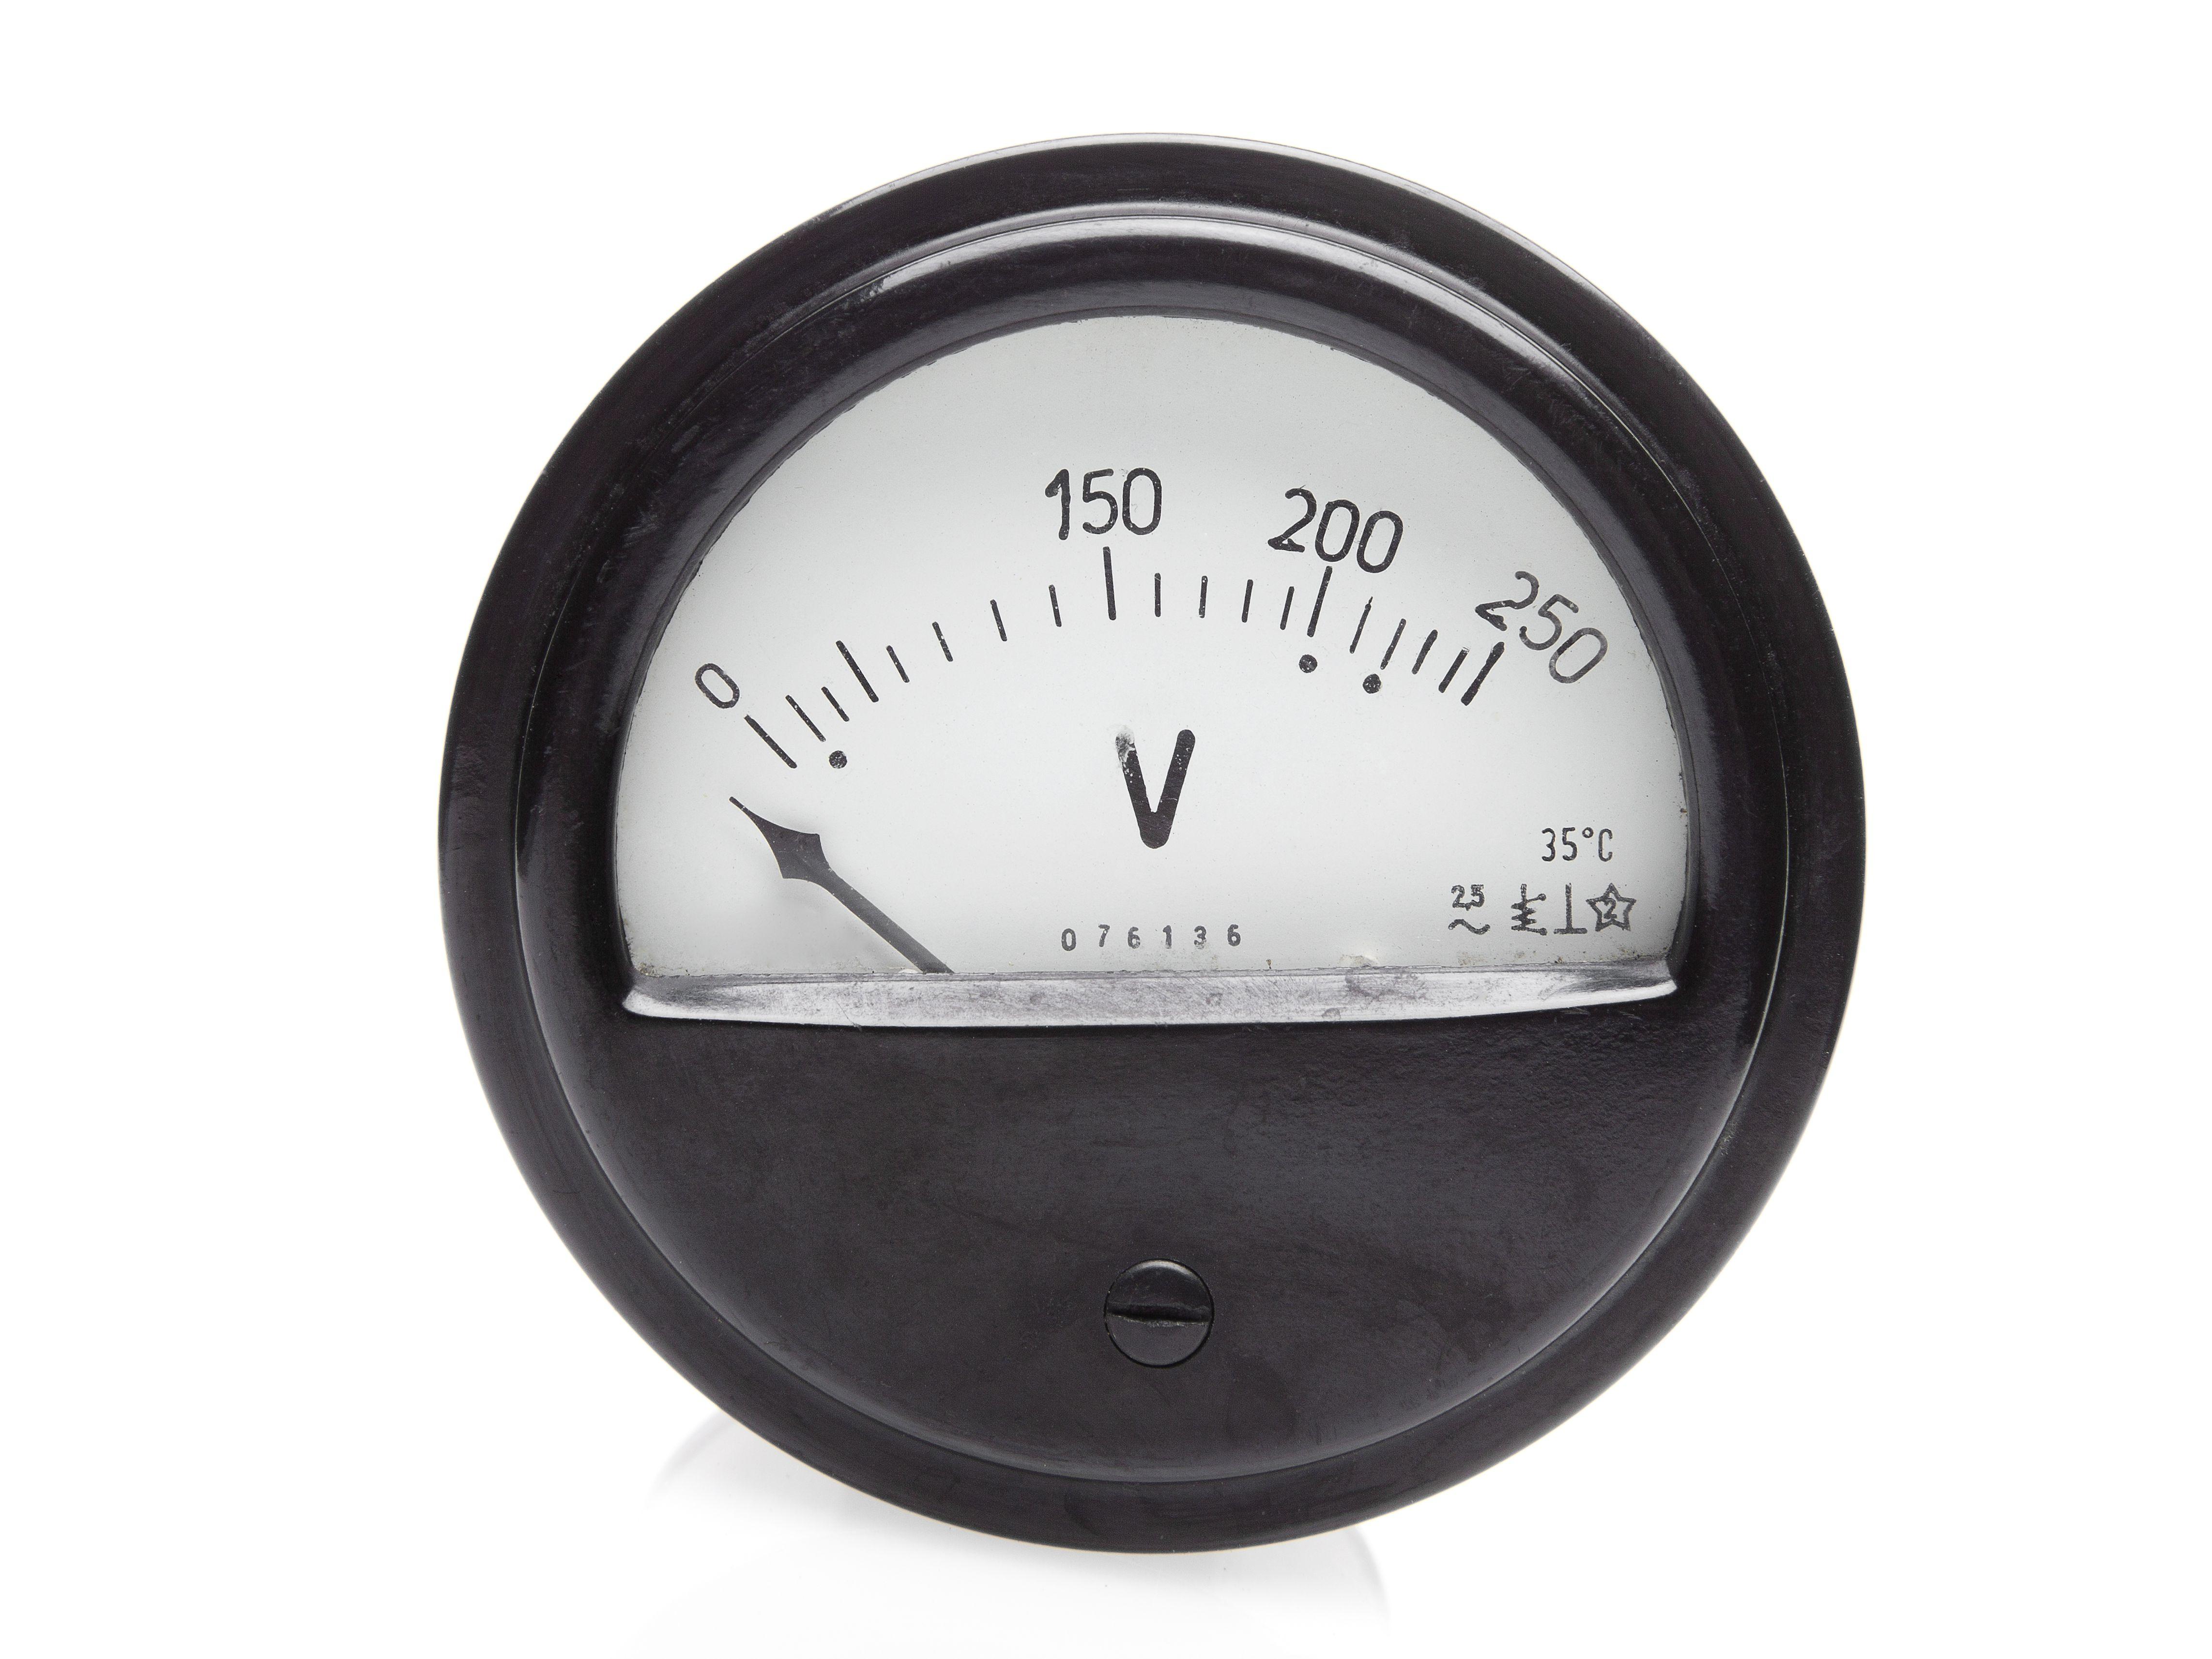 basic motorcycle wiring diagram voltmeter how to install a voltmeter on your boat  how to install a voltmeter on your boat